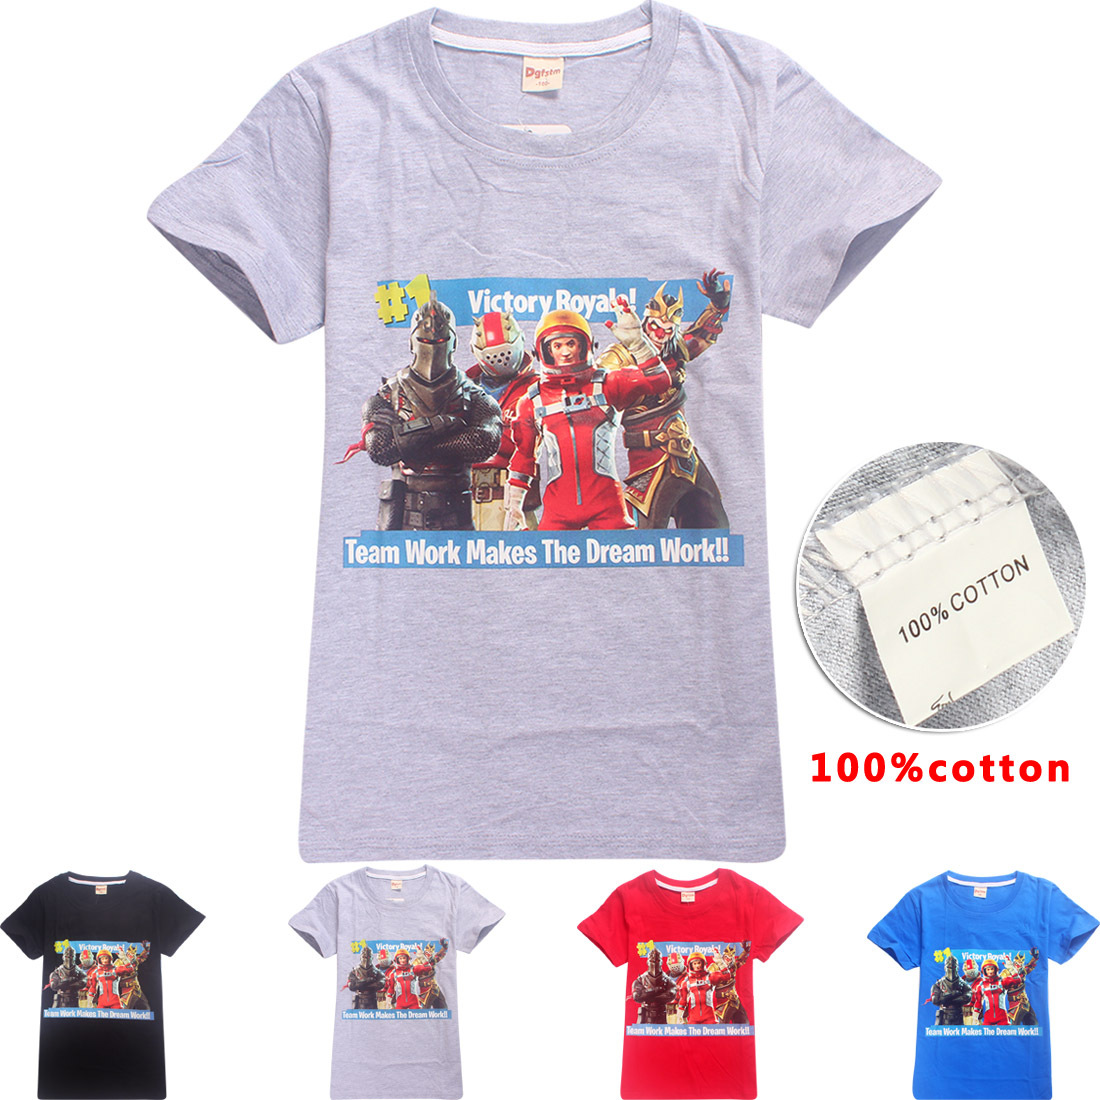 100% cotton Brand T-shirt Summer Kids Boys Girls Short-sleeved Tops Tees Fortnite Gaming Boy Funny Tshirt Teenage 6-13t Clothing